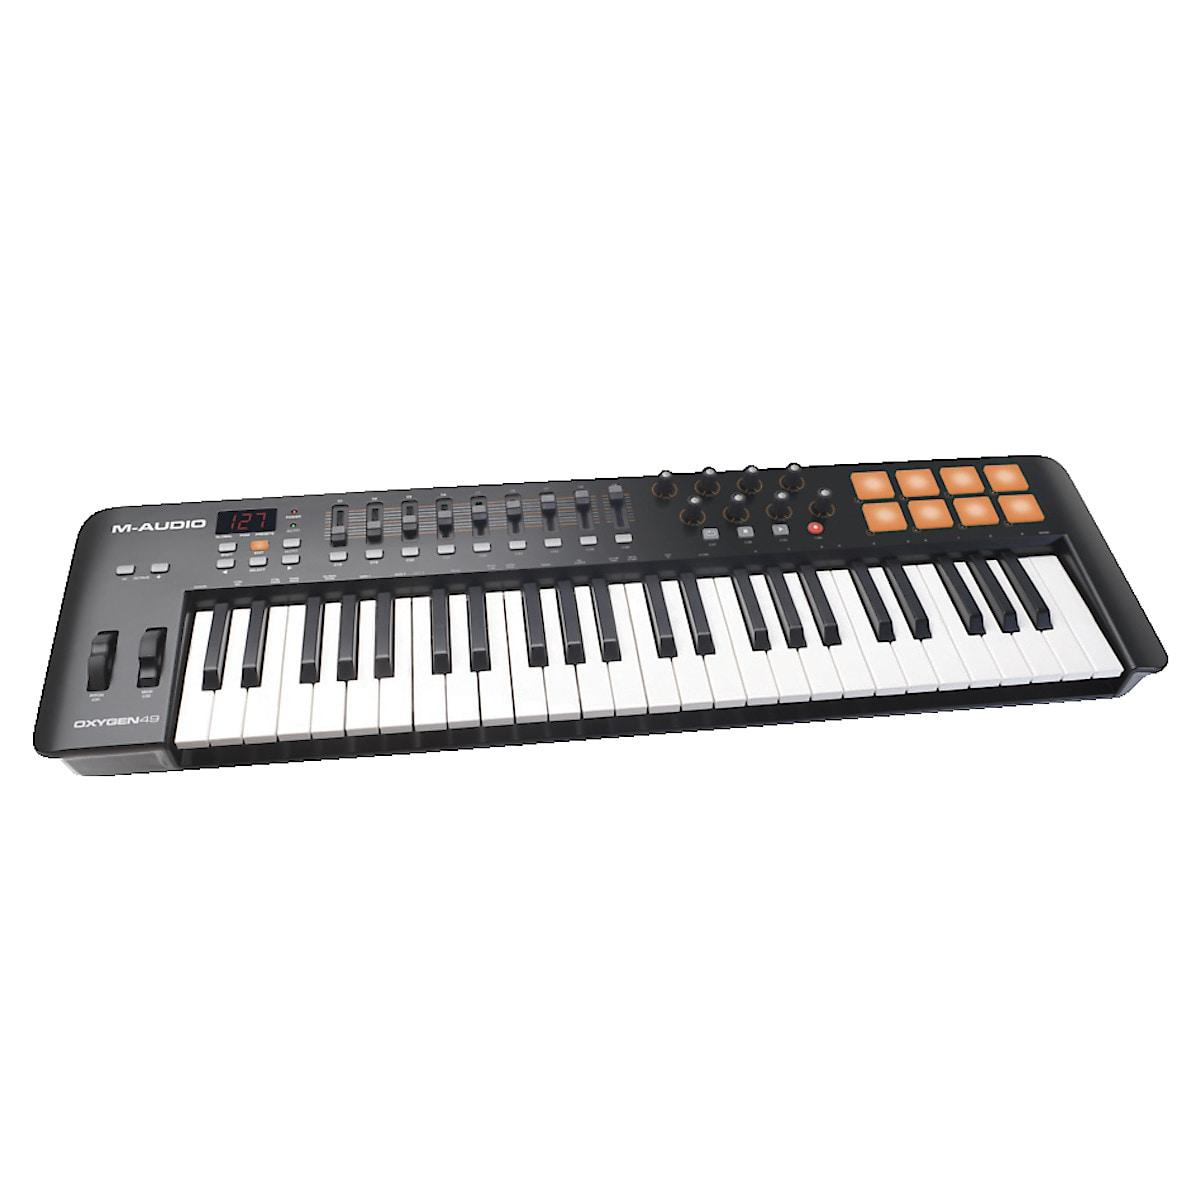 Klaviatur M-Audio Oxygen 49 (4th generation)